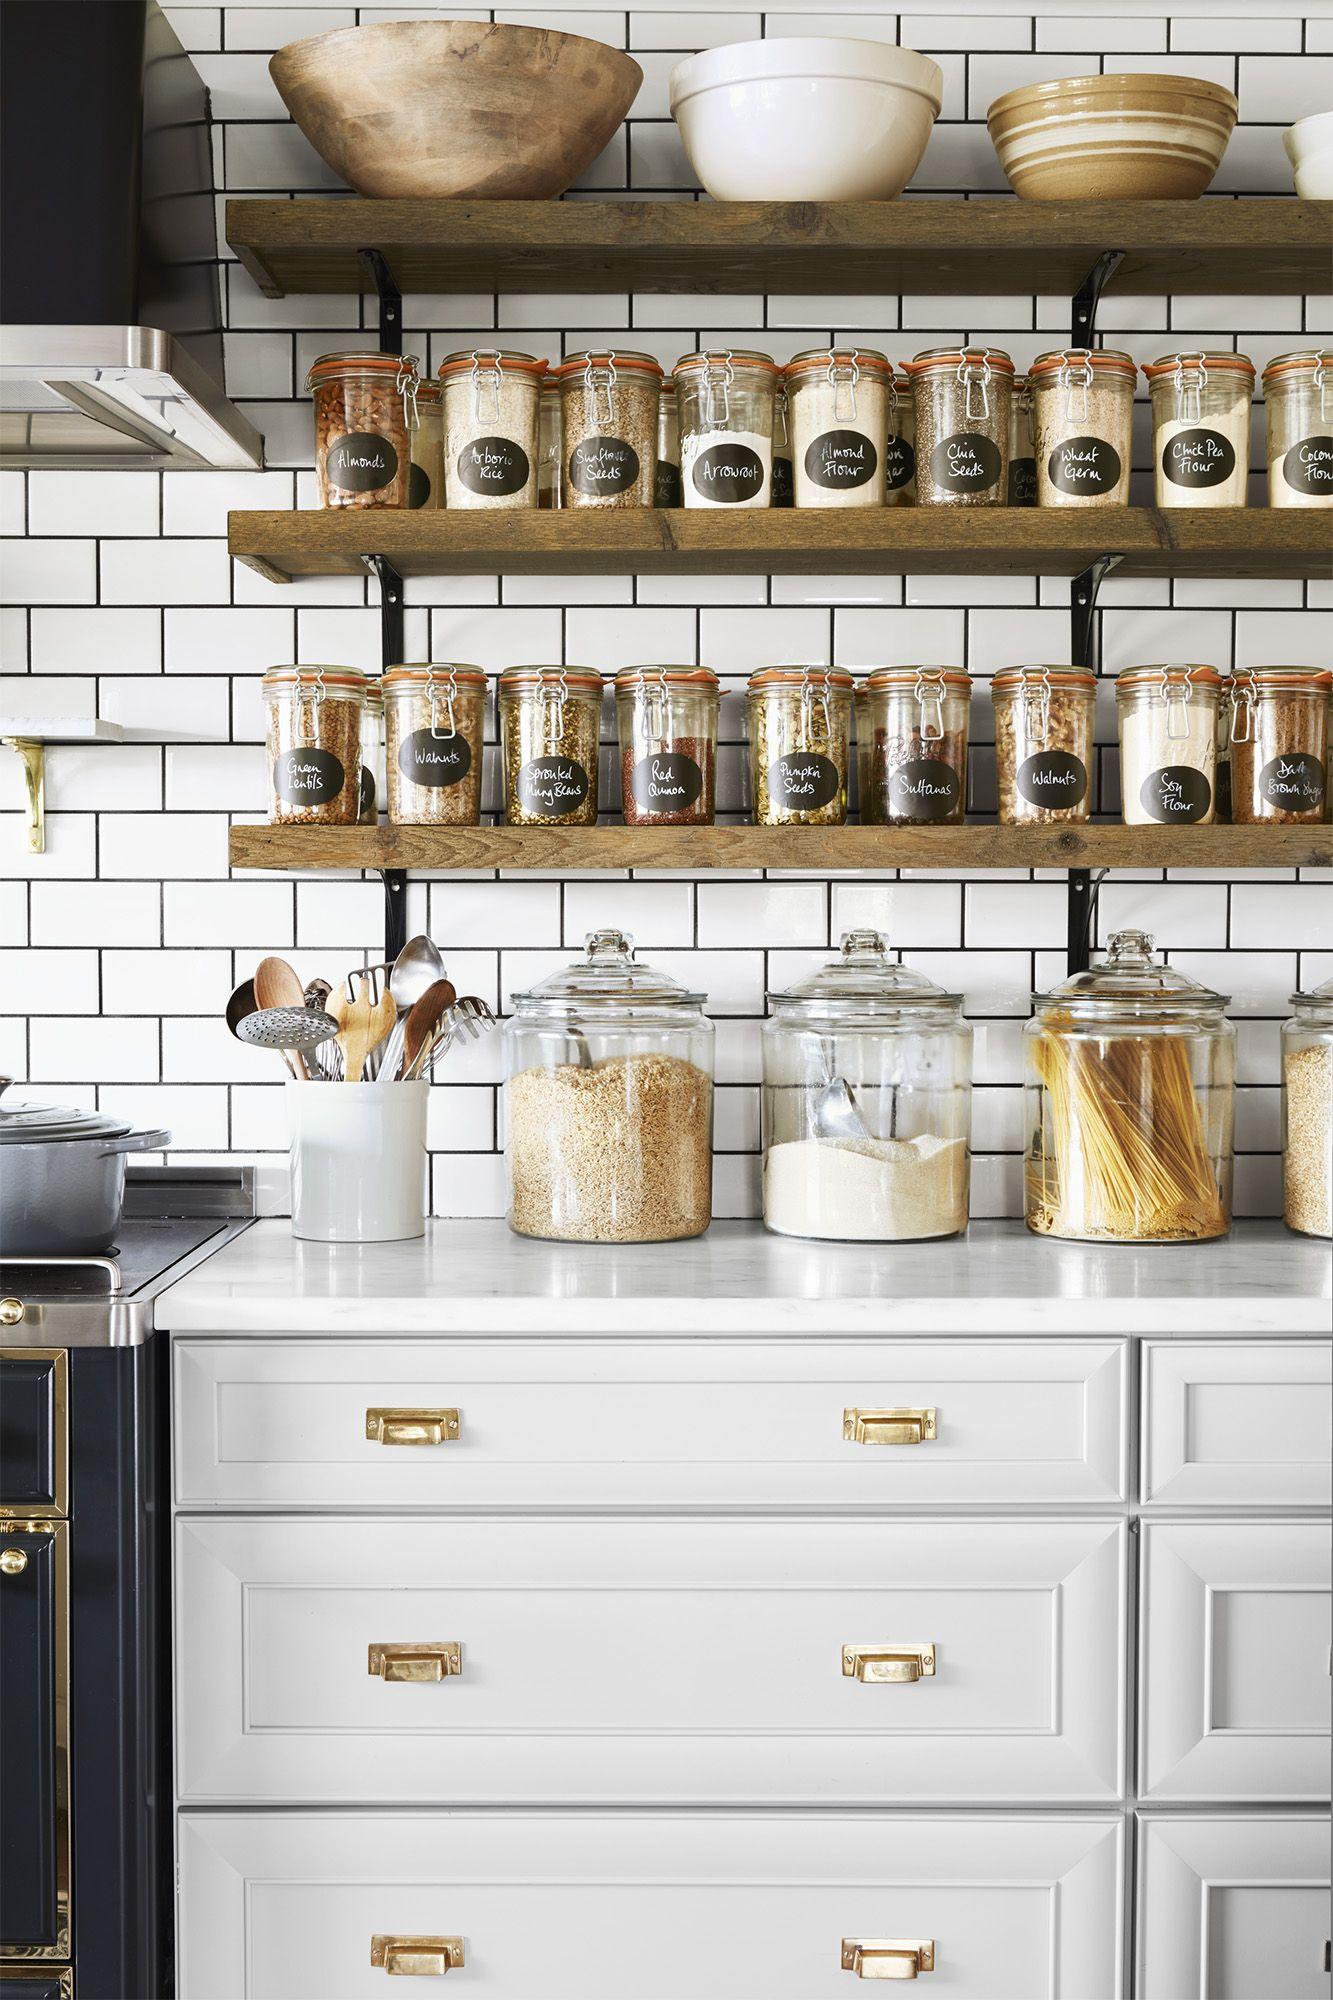 30 Kitchen Organization Ideas Kitchen Organizing Tips And Tricks